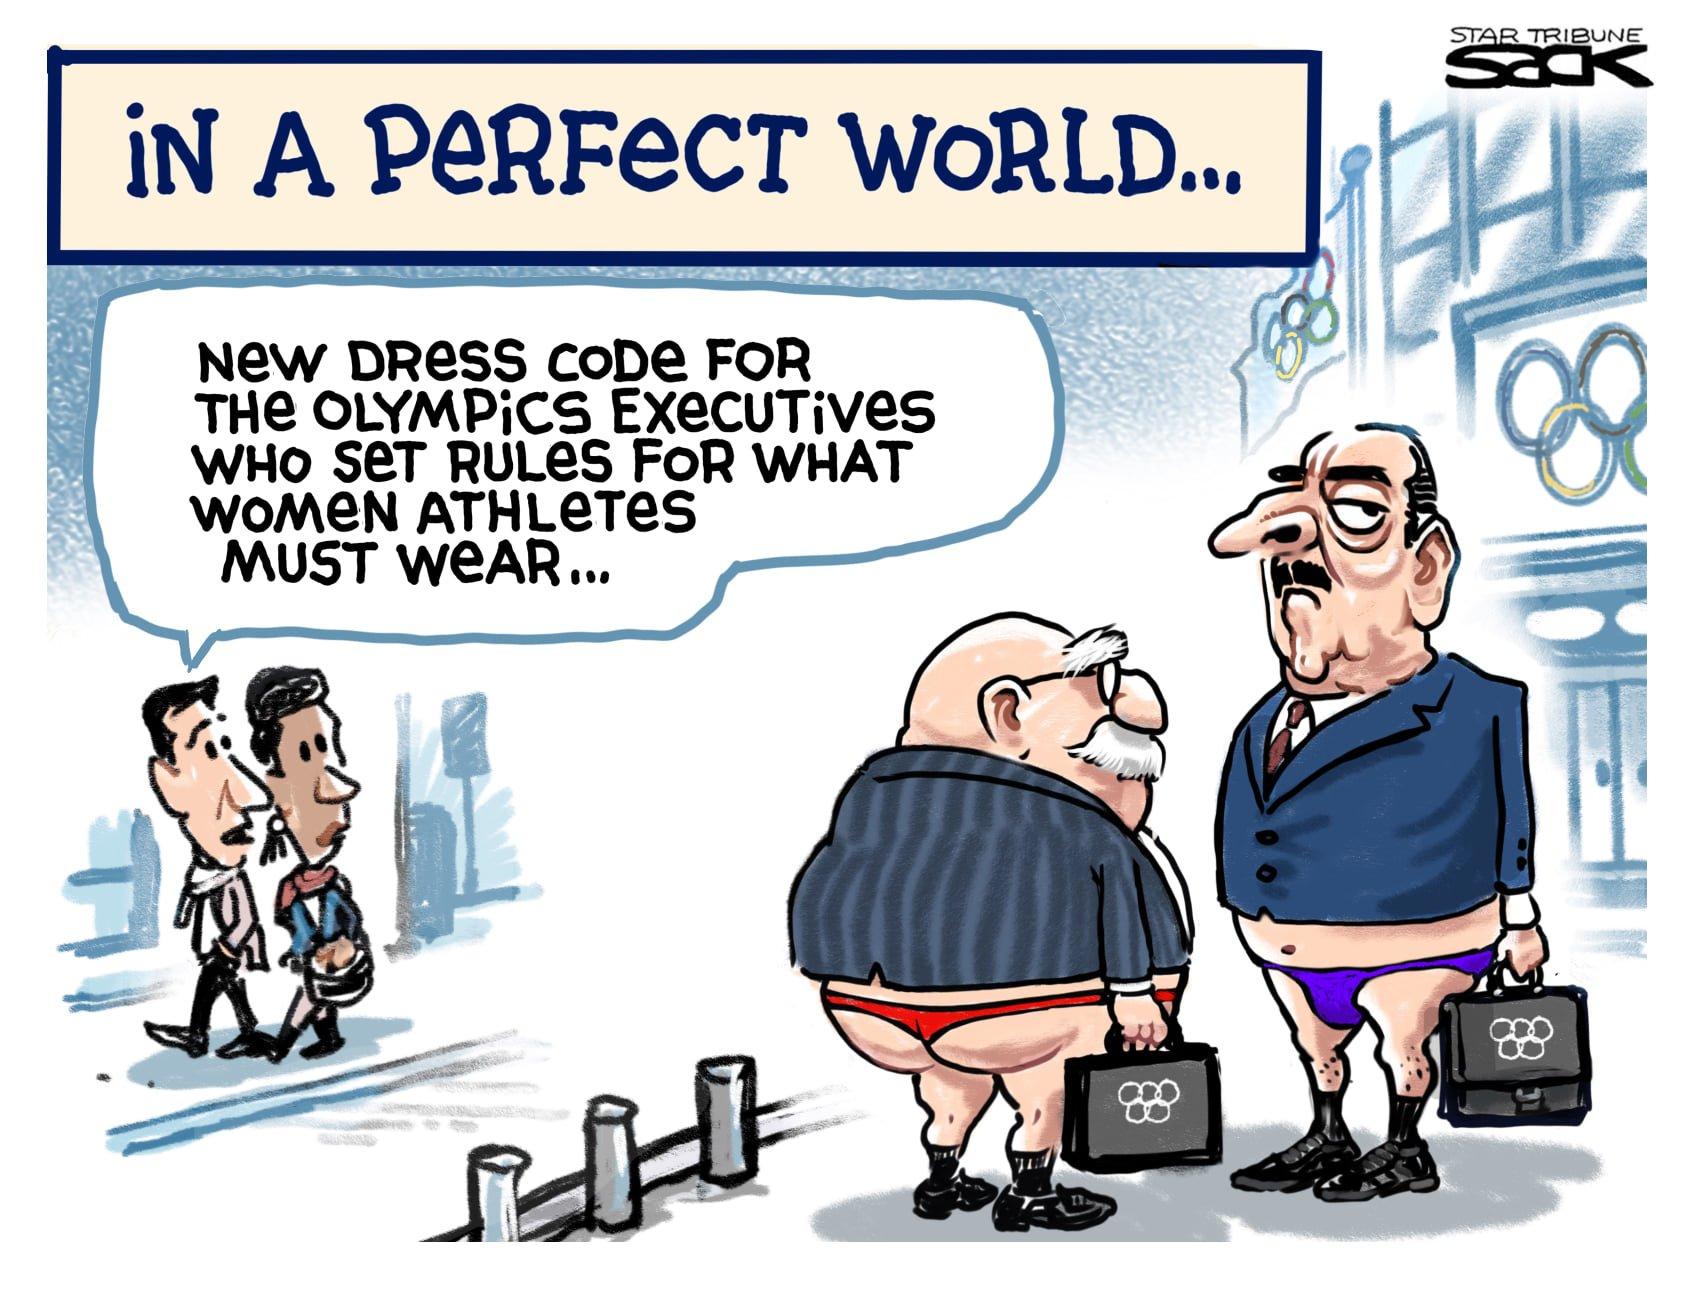 Editorial cartoon in the Star Tribune by Steve Sack: Olympics Dress Code (27 June 2021)